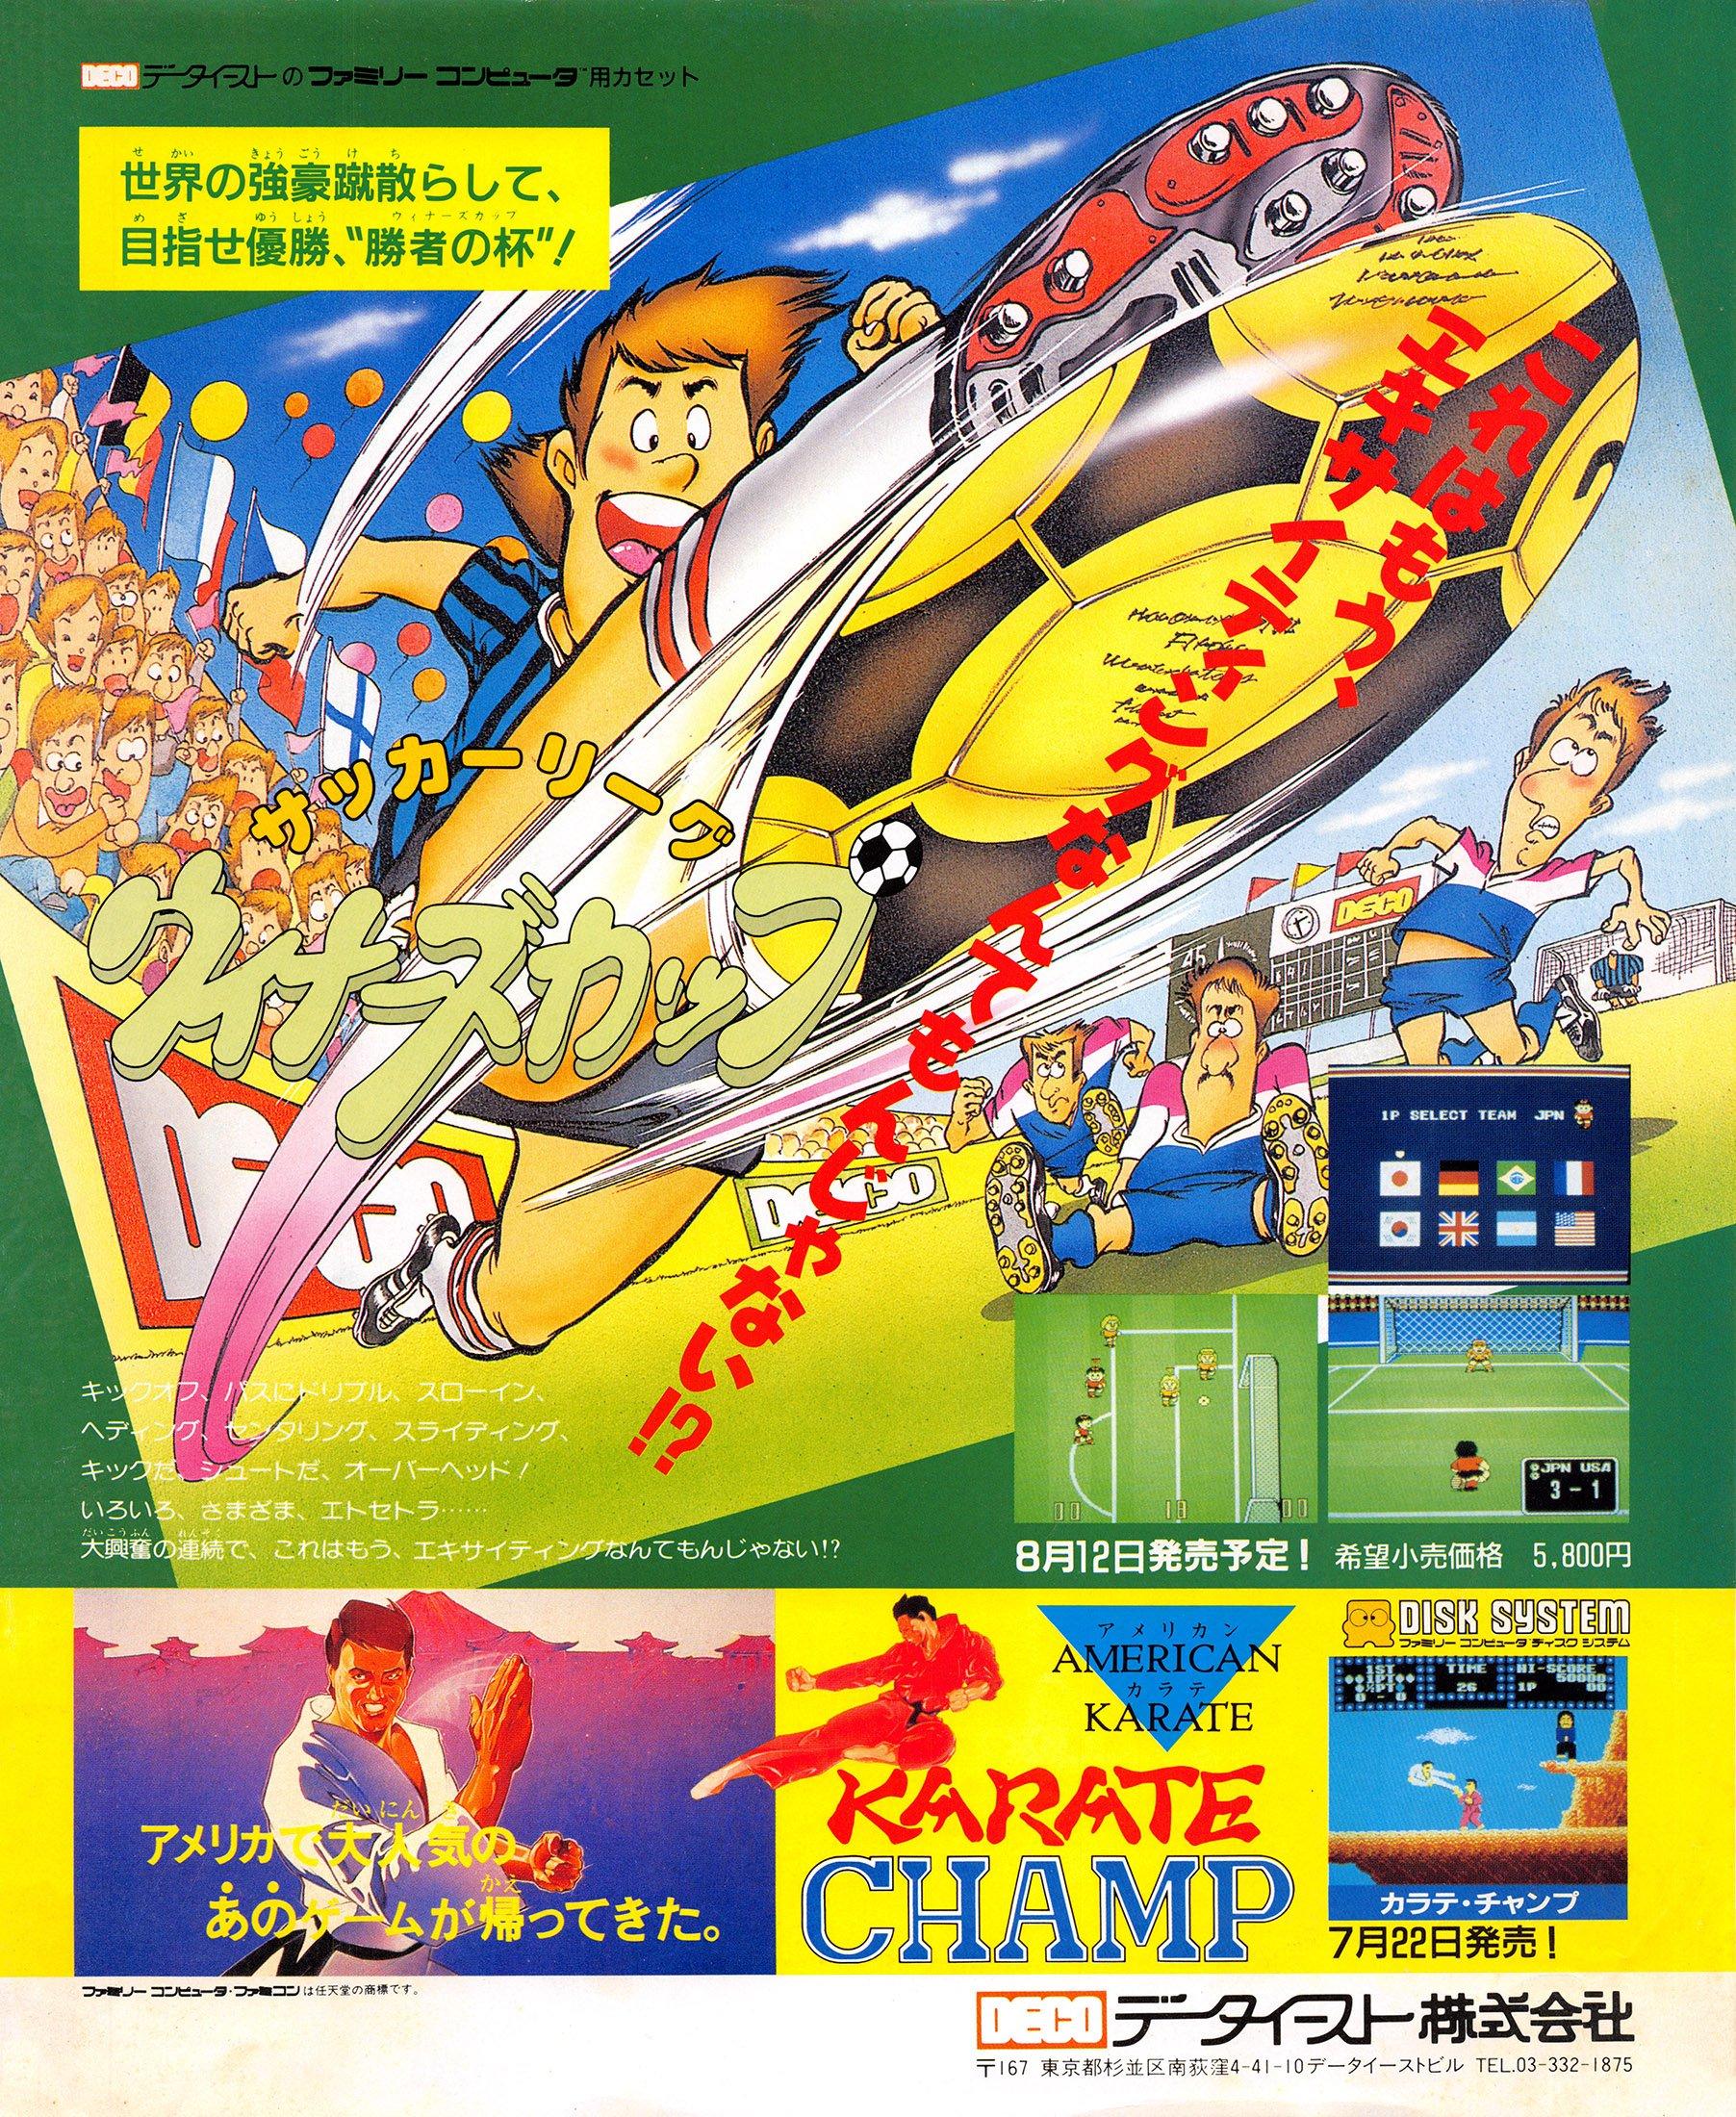 Soccer League - Winner's Cup, Karate Champ (Japan) v1